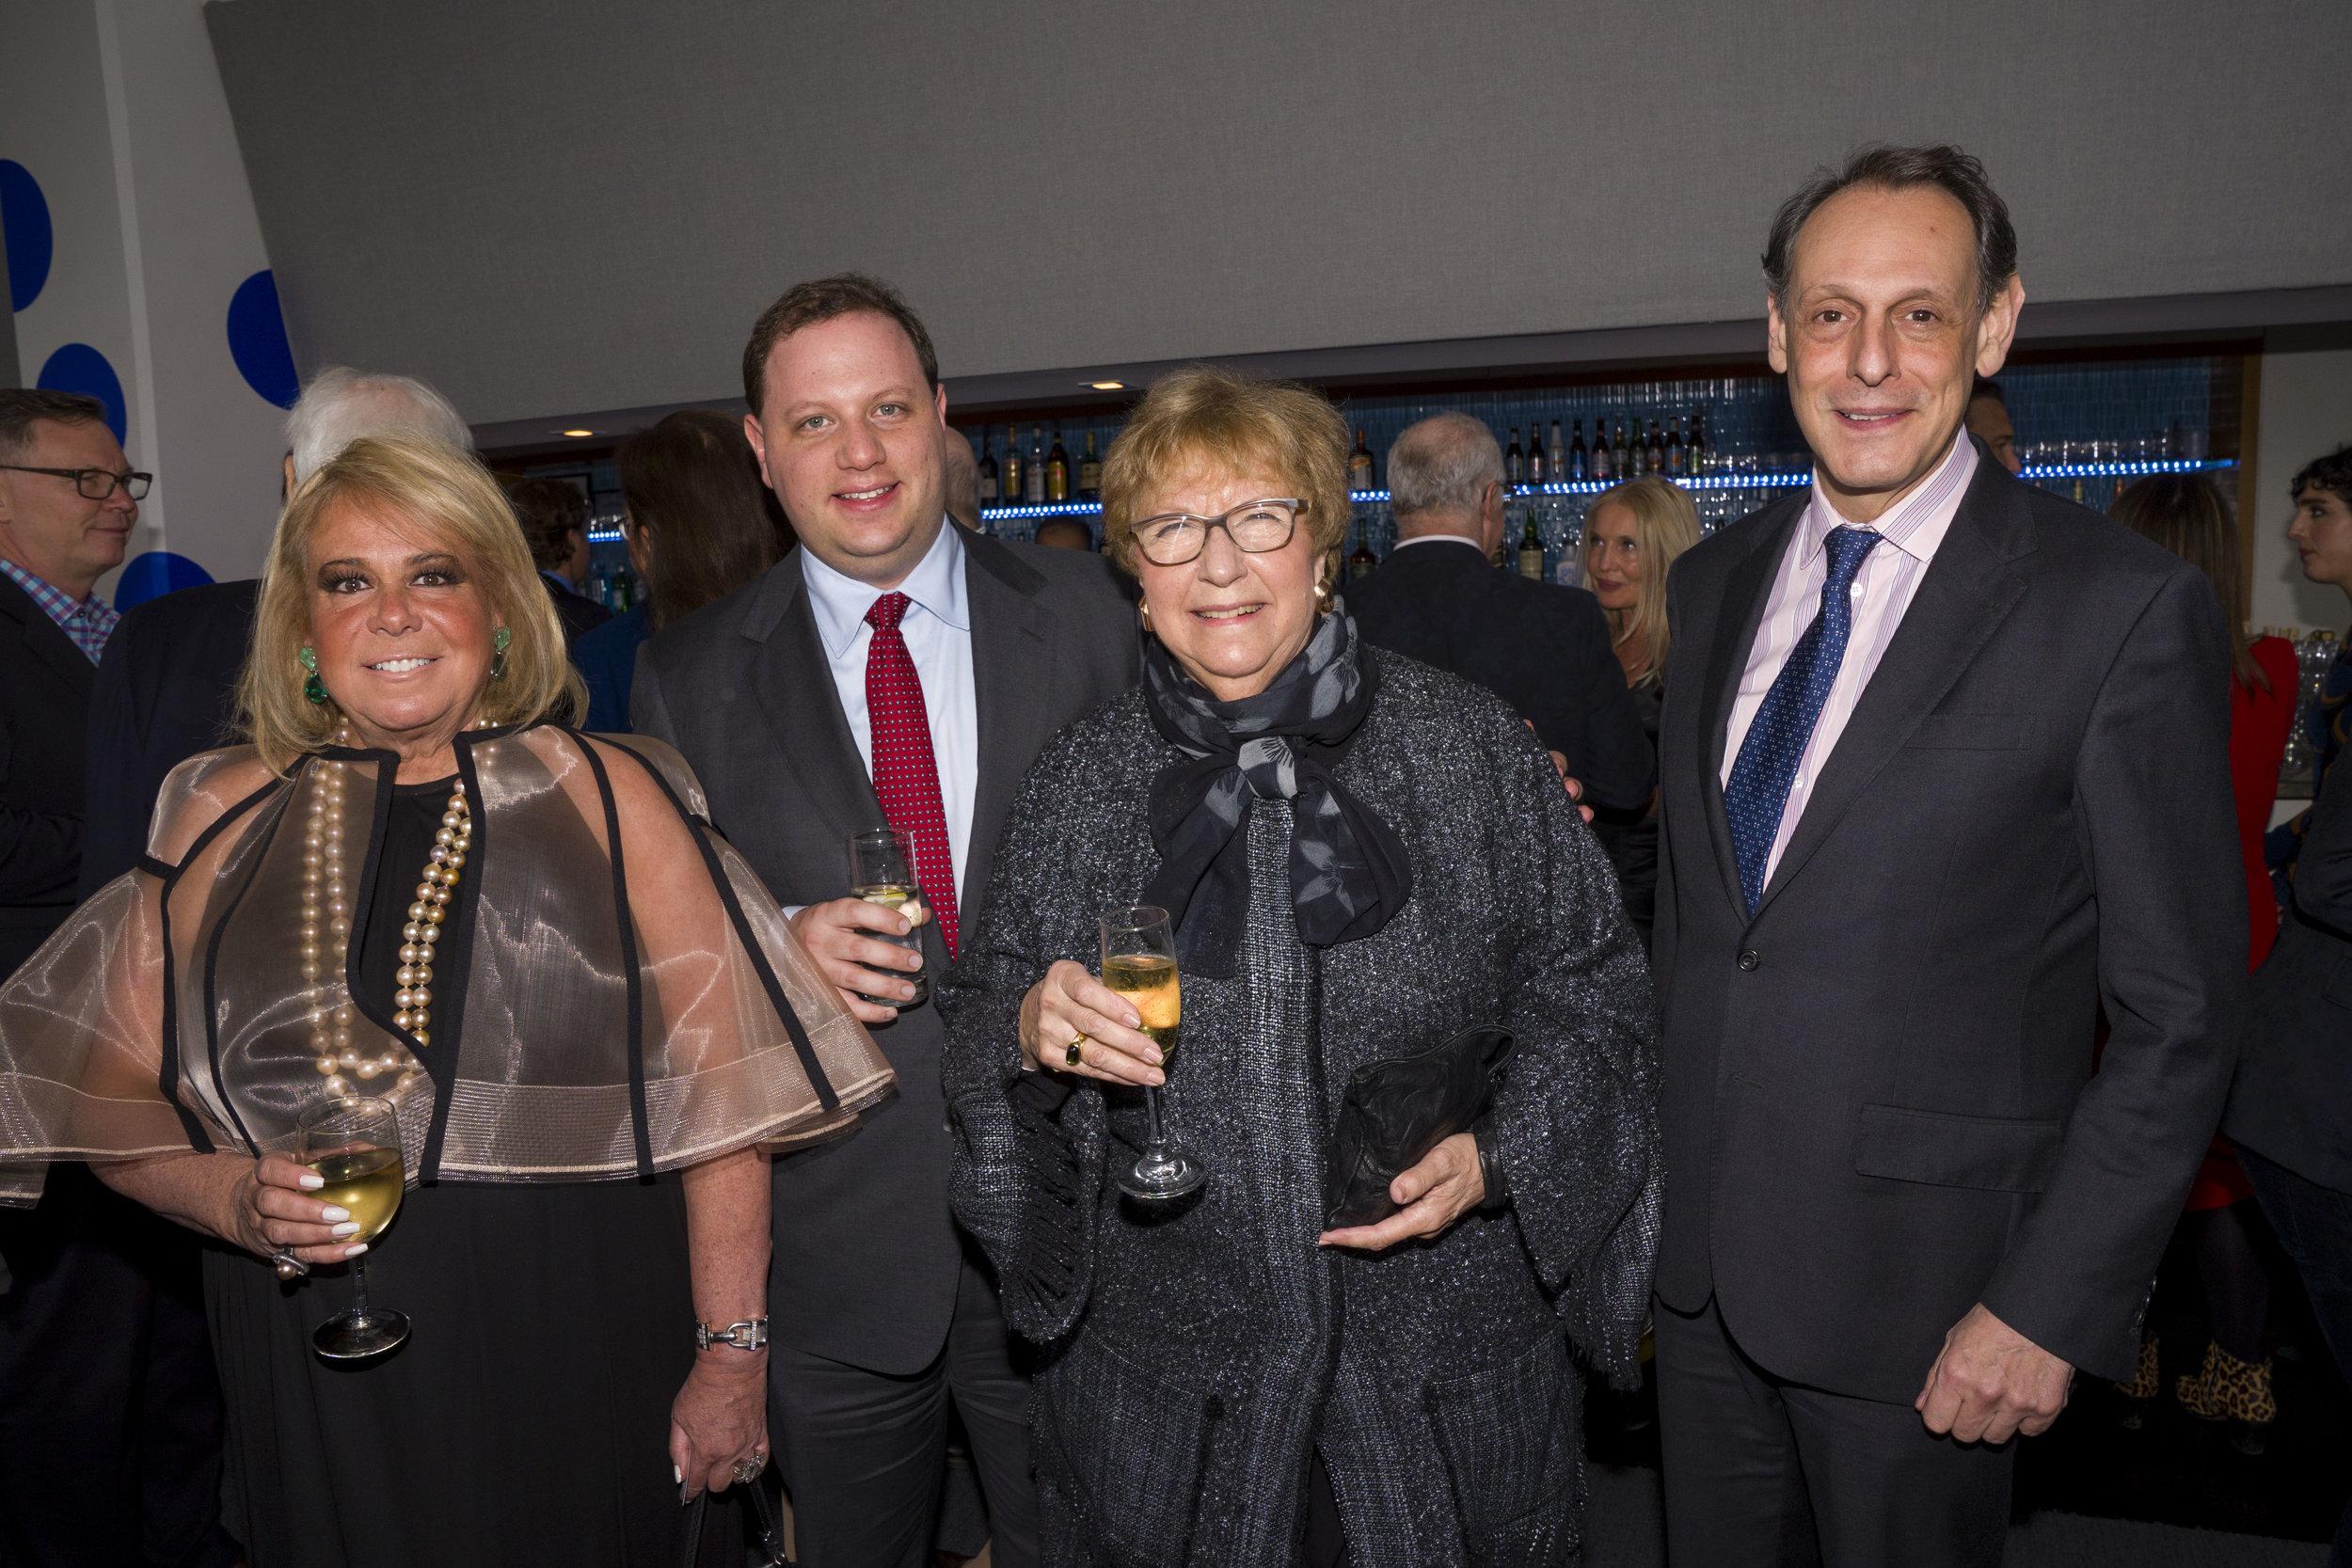 Joanna Fisher, Reni Rothschild,Daniel Rothschild, Jonathan Marder.jpg